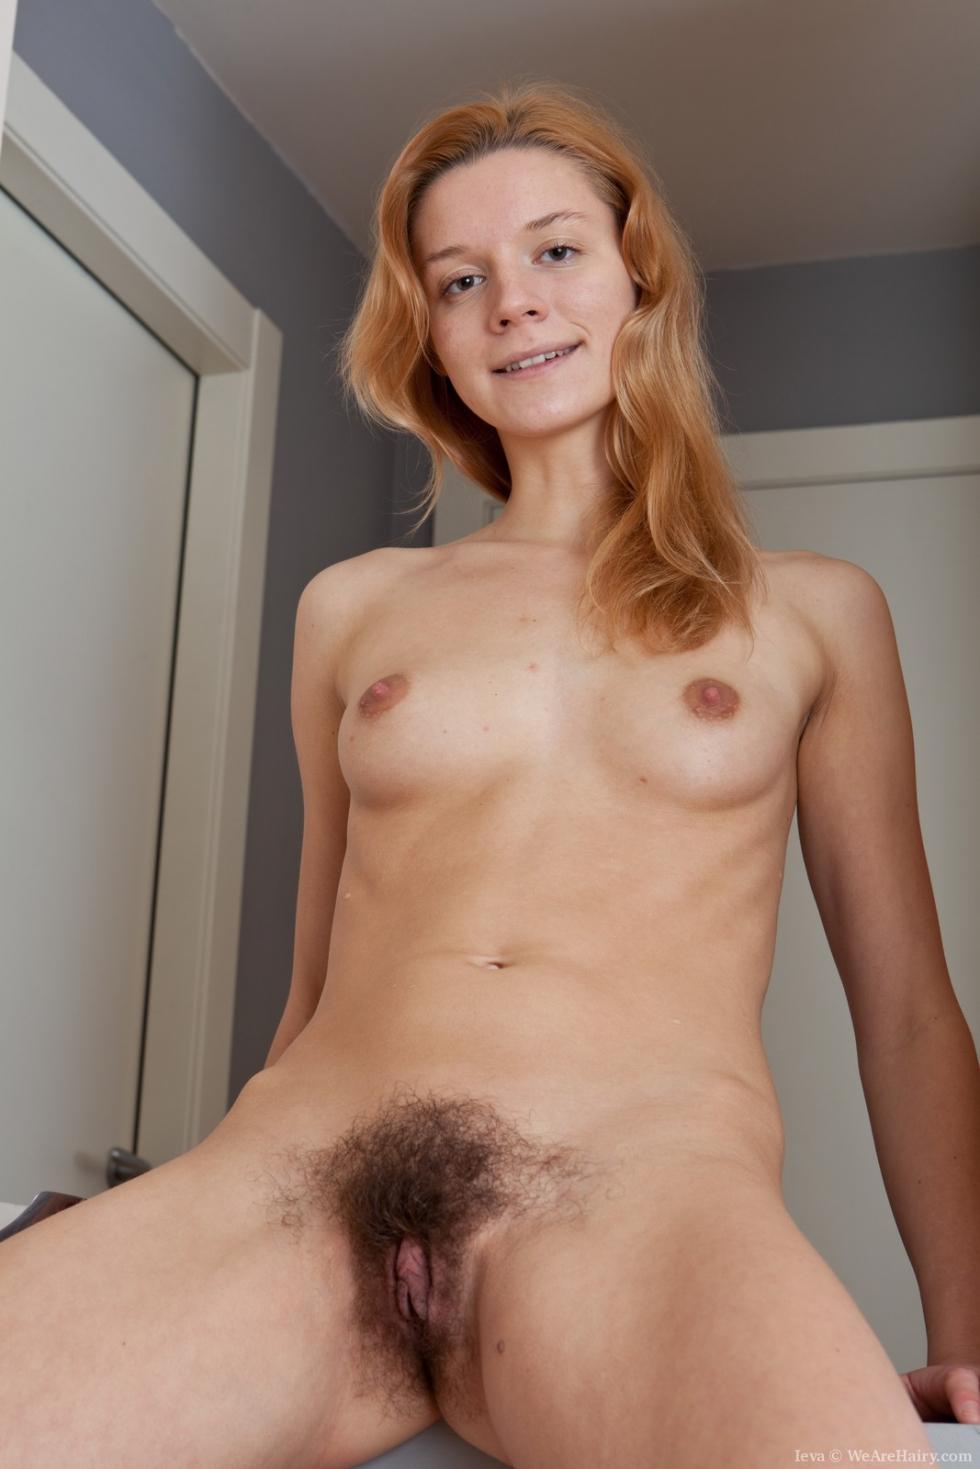 innocent hairy Search - XVIDEOSCOM